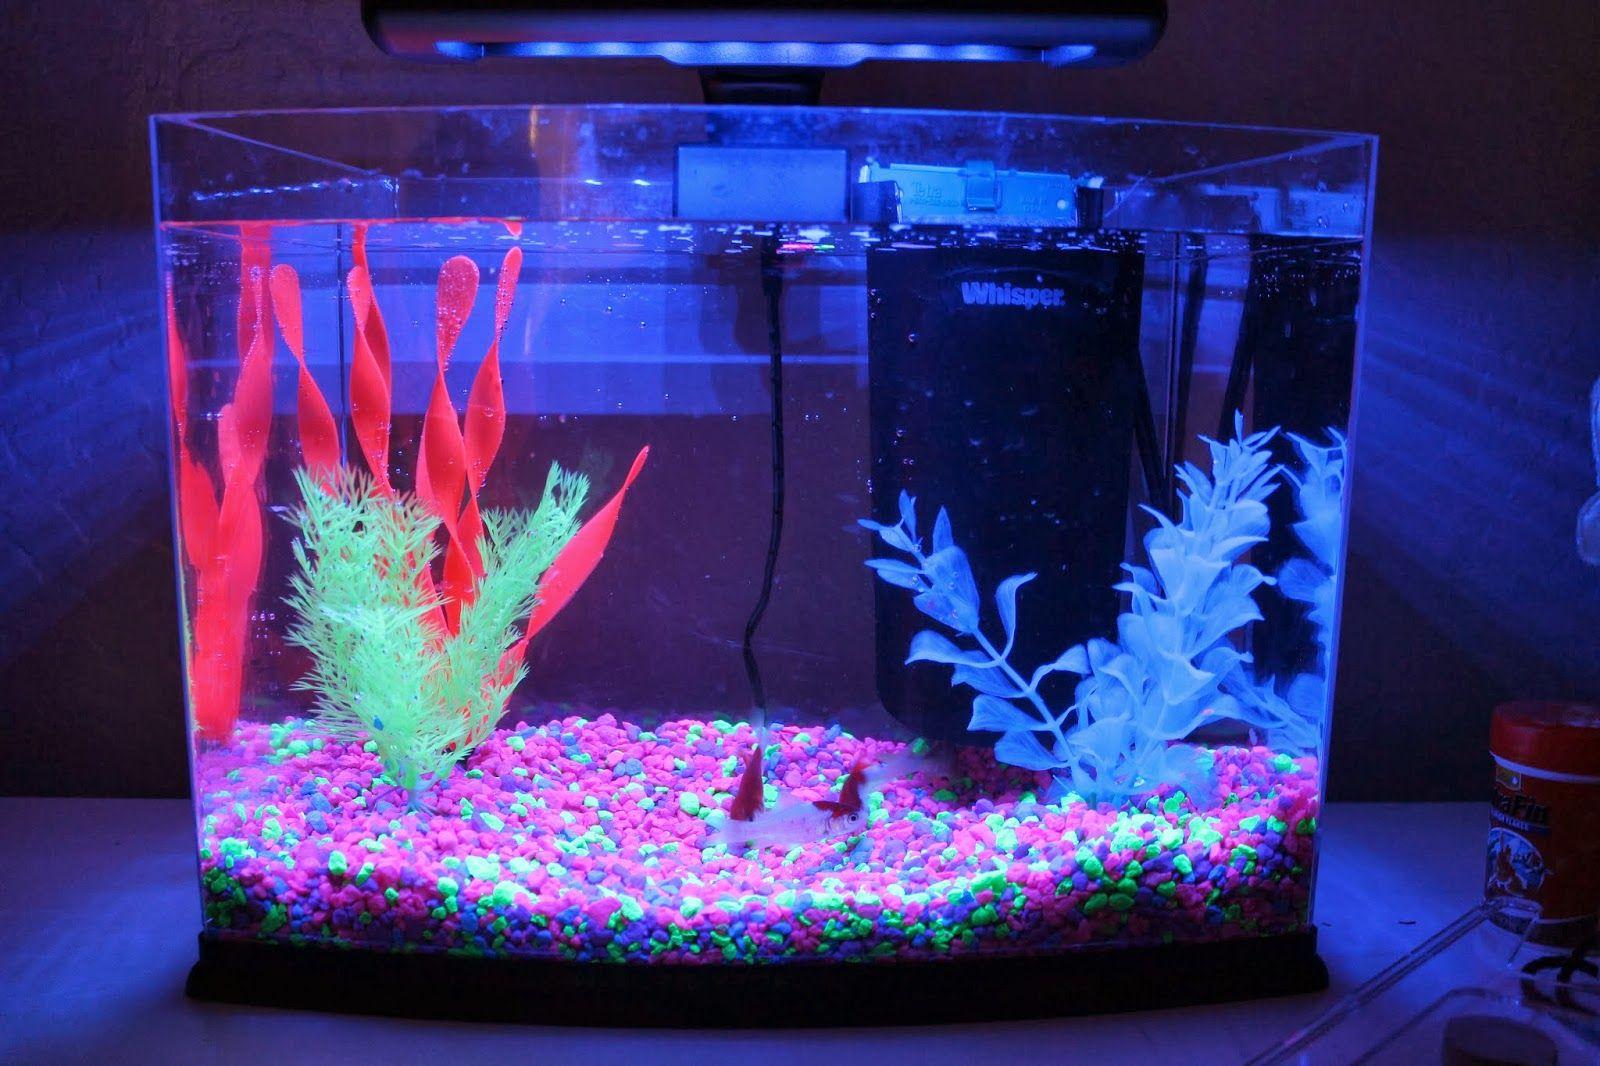 Glow in the dark fish tank xander ideas pinterest for Glow in dark fish